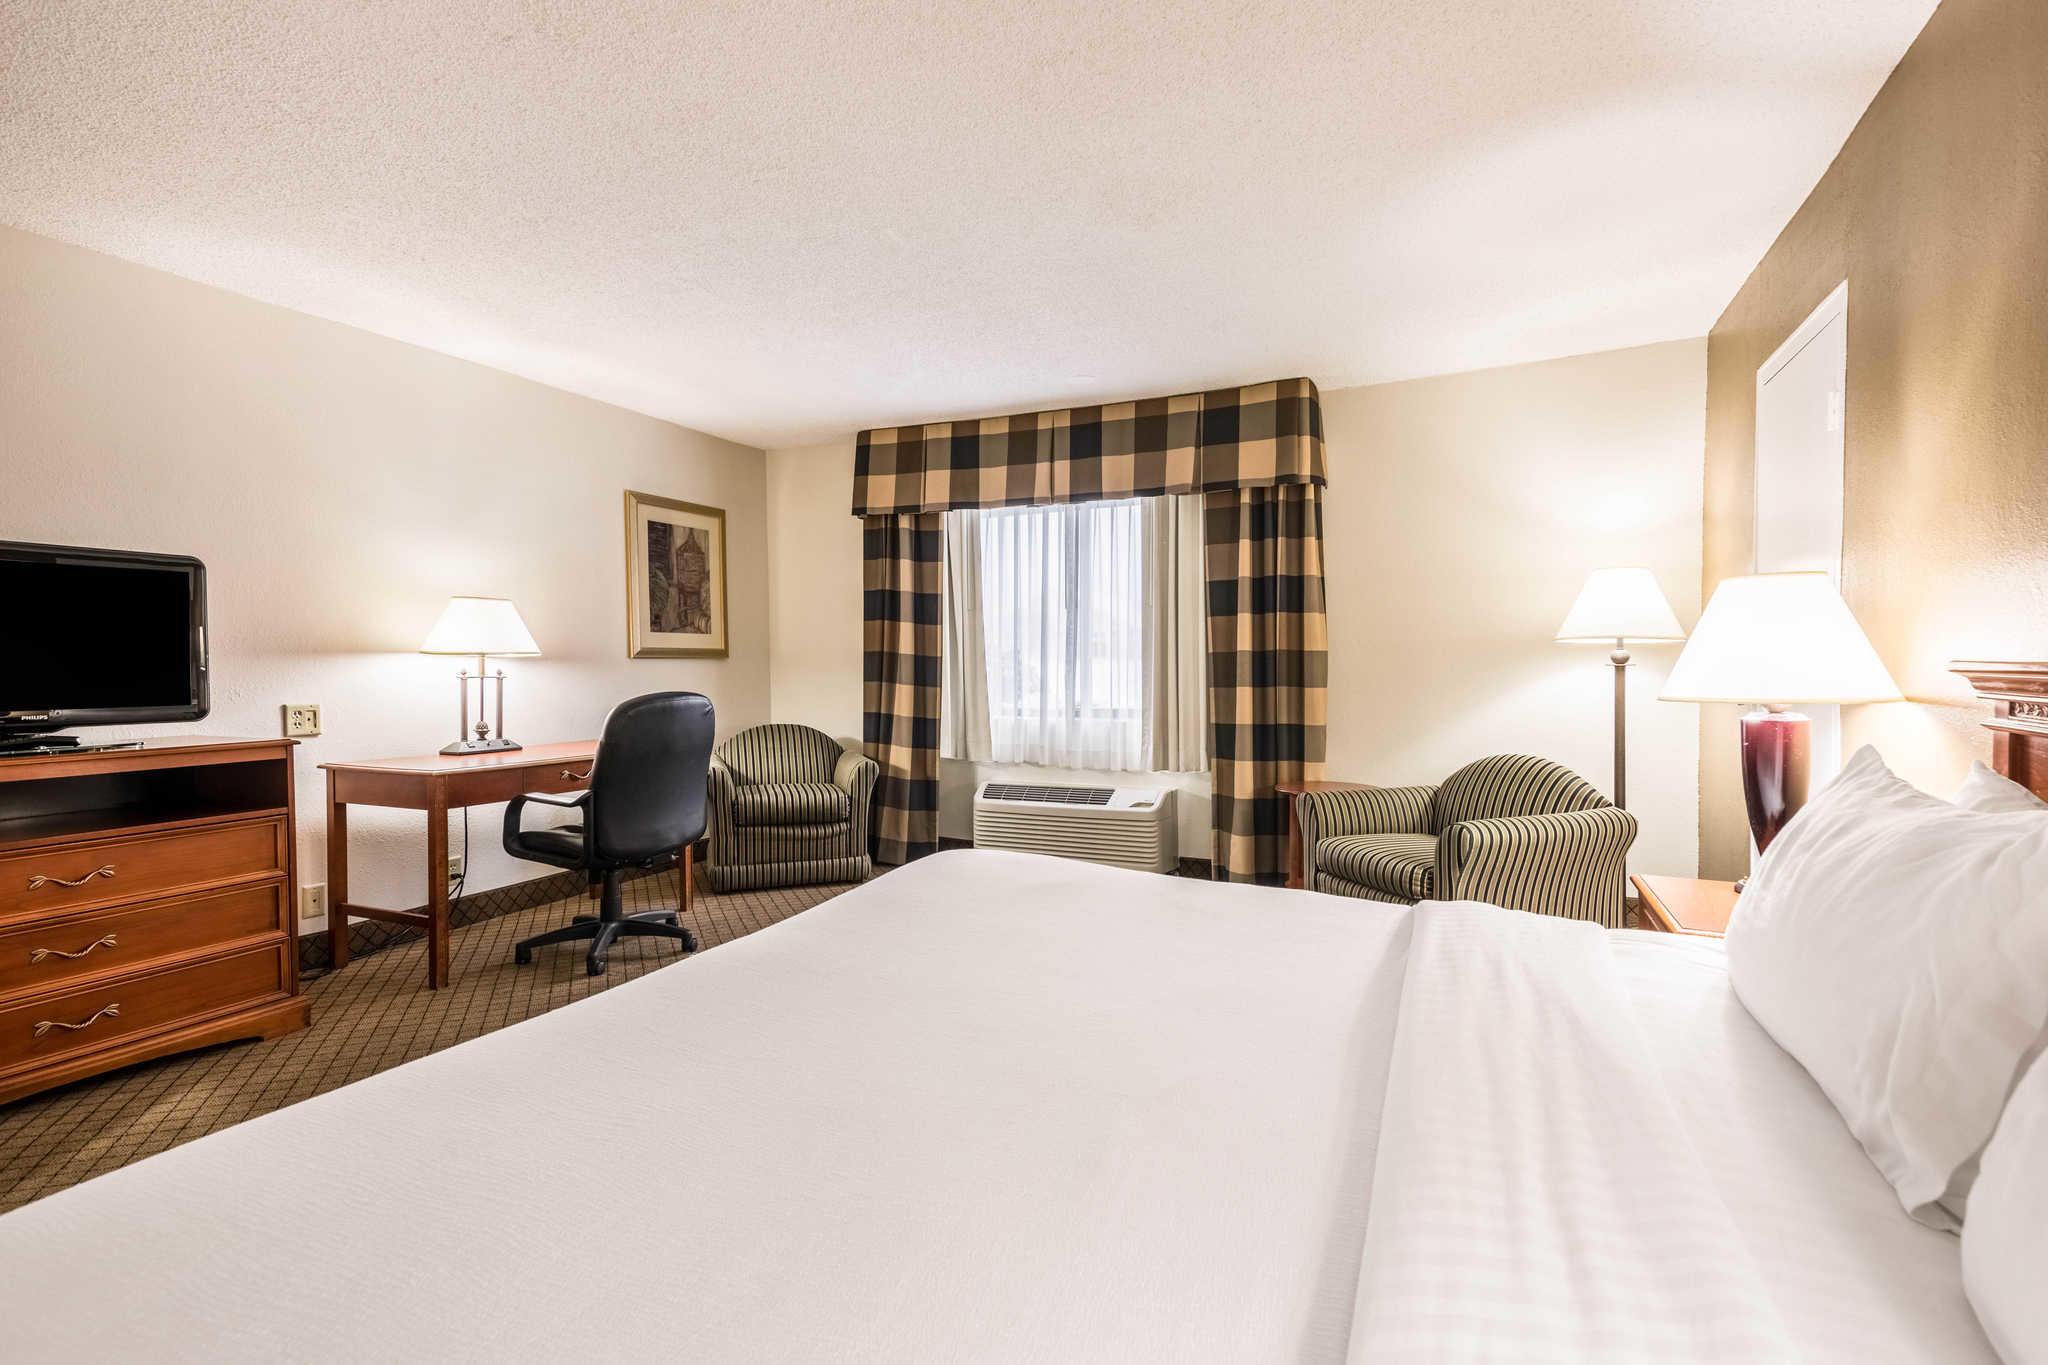 Quality Inn near Finger Lakes and Seneca Falls image 17